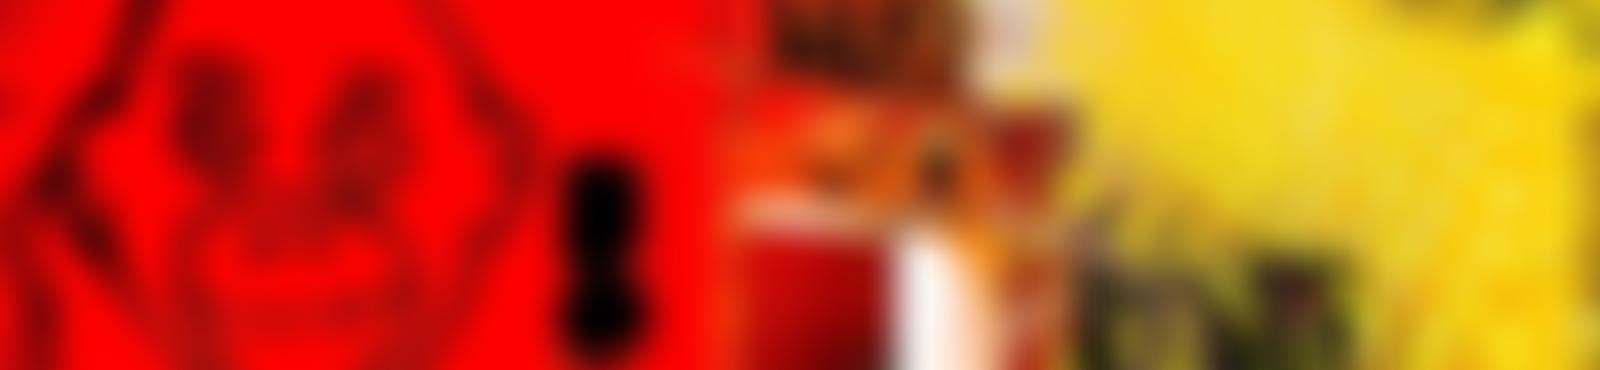 Blurred 2870e23c bc48 4d2a bf26 7d3c2a8963a4